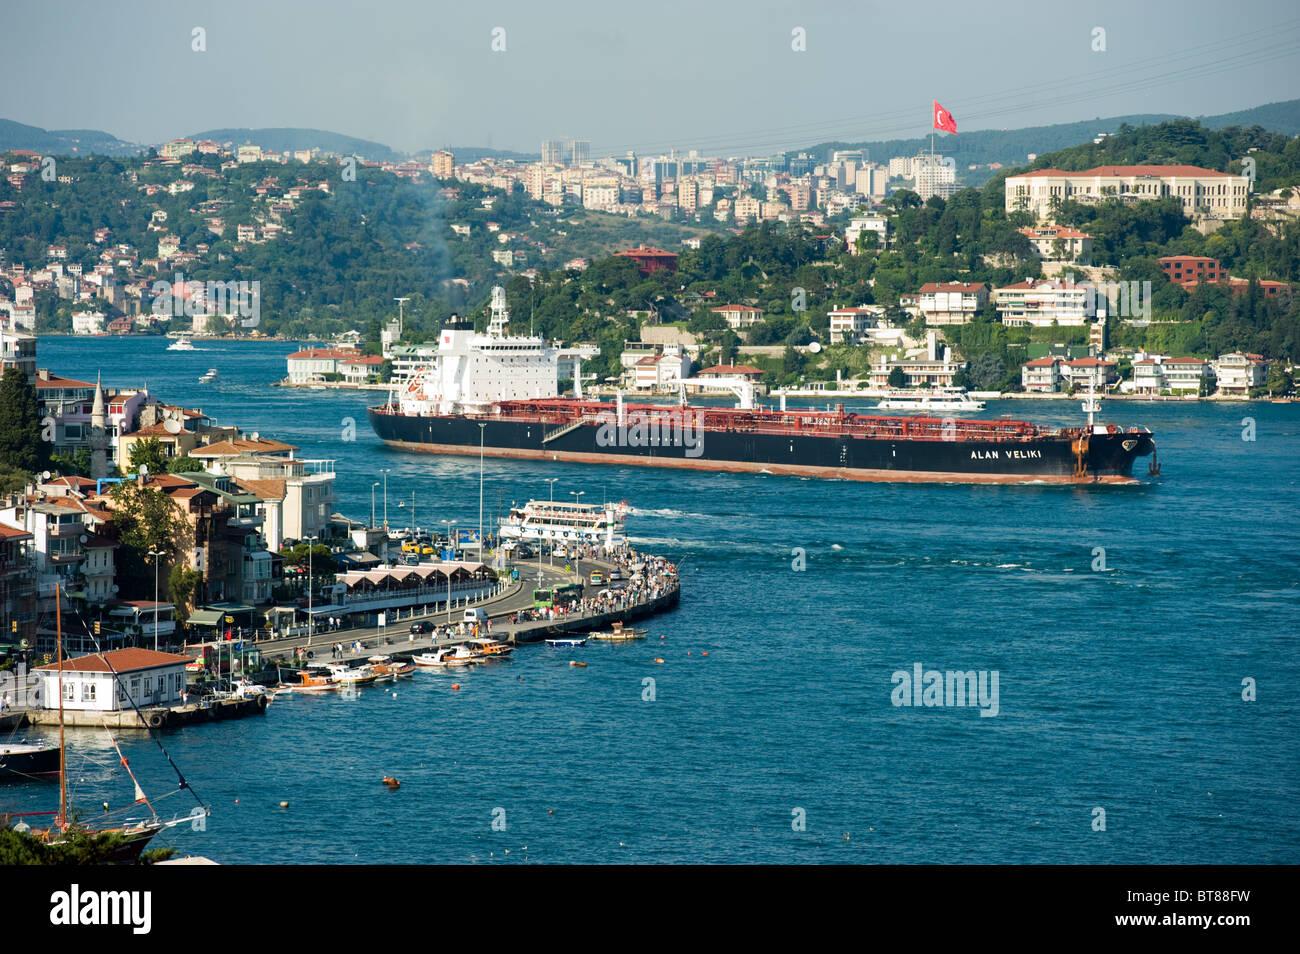 Oil tanker crossing Bosporus Strait Istanbul Turkey - Stock Image